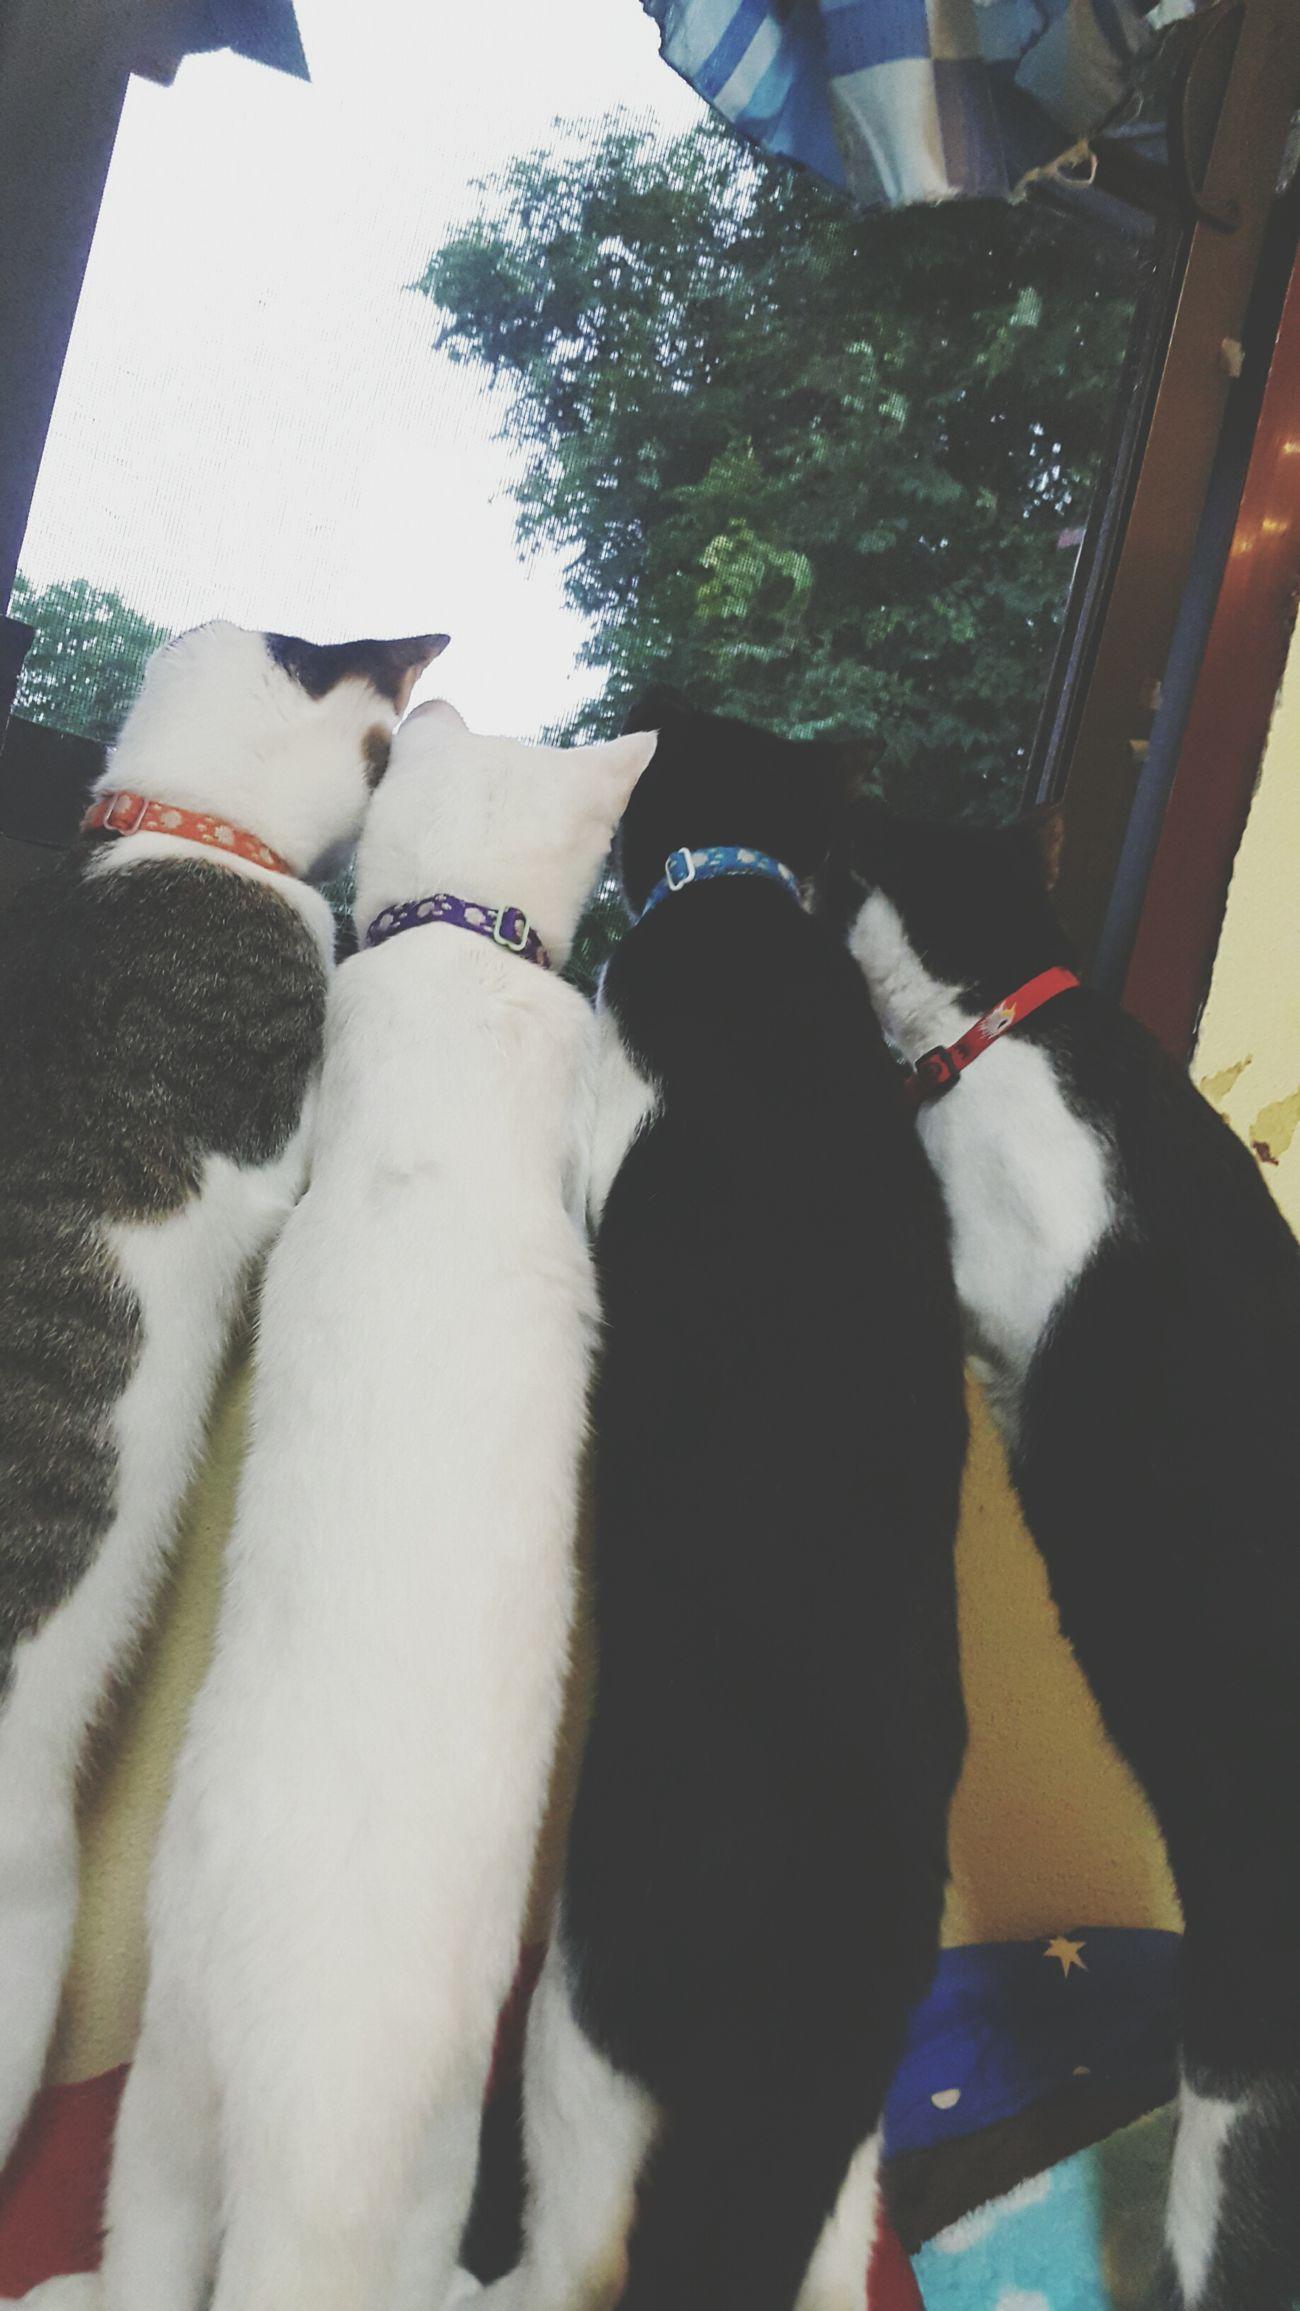 😚 Cat Cats Cat♡ Cat Lovers Catsofinstagram Cats Of EyeEm Cat Watching Mycat My Cats